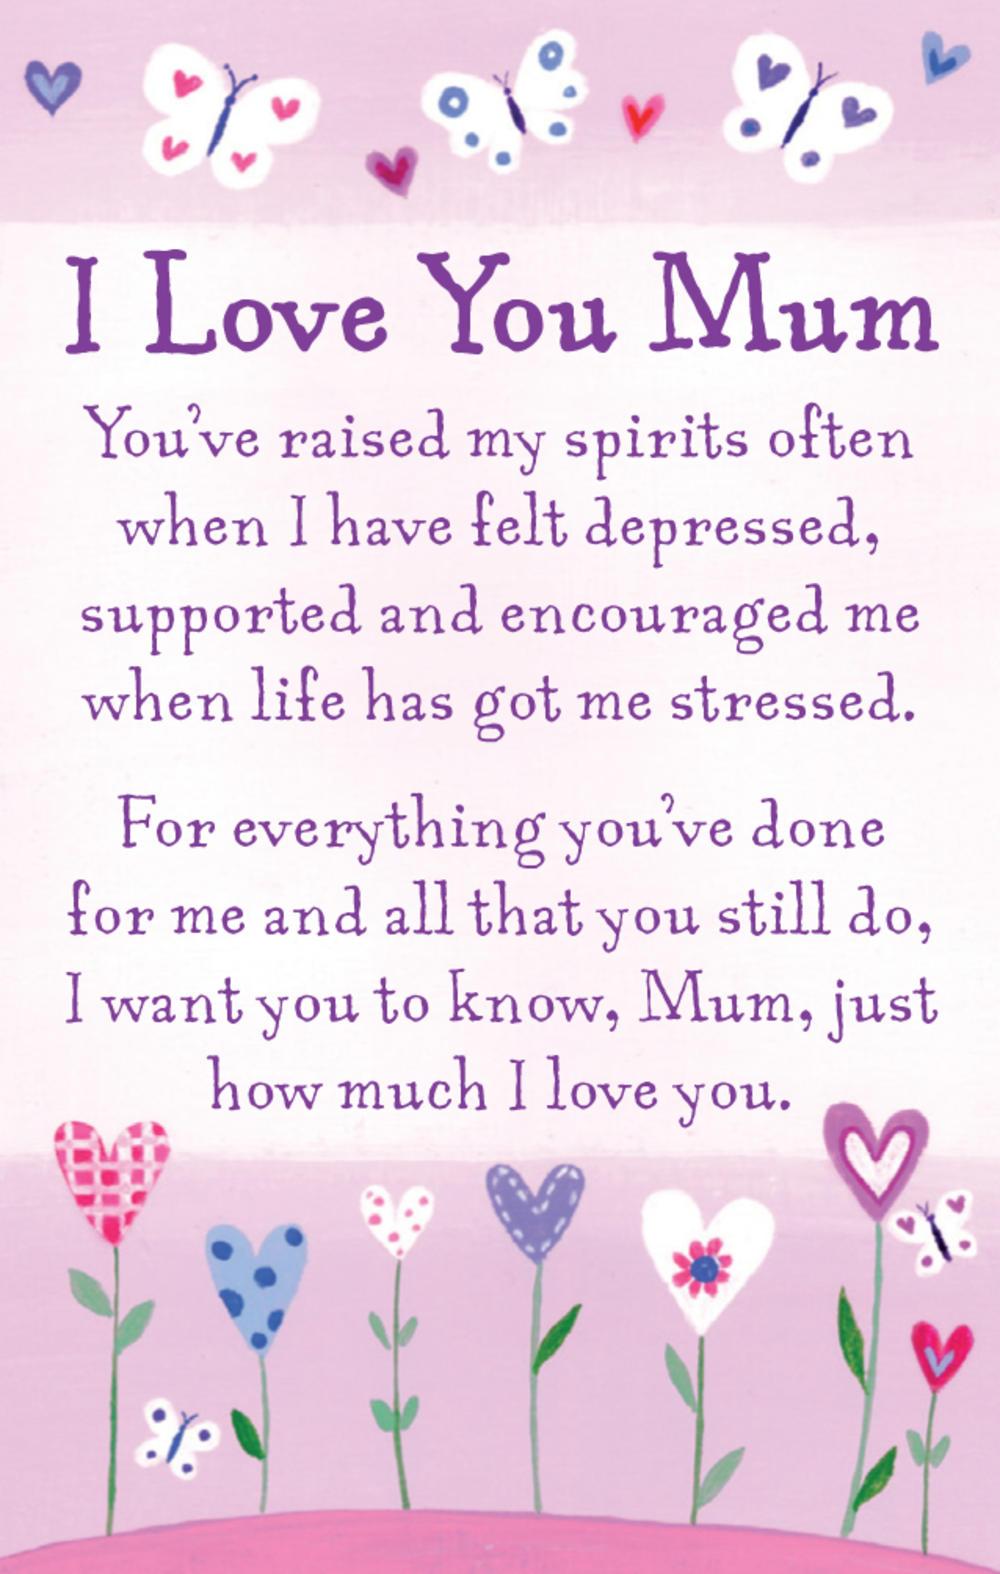 I Love You Mum Heartwarmers Keepsake Credit Card & Envelope